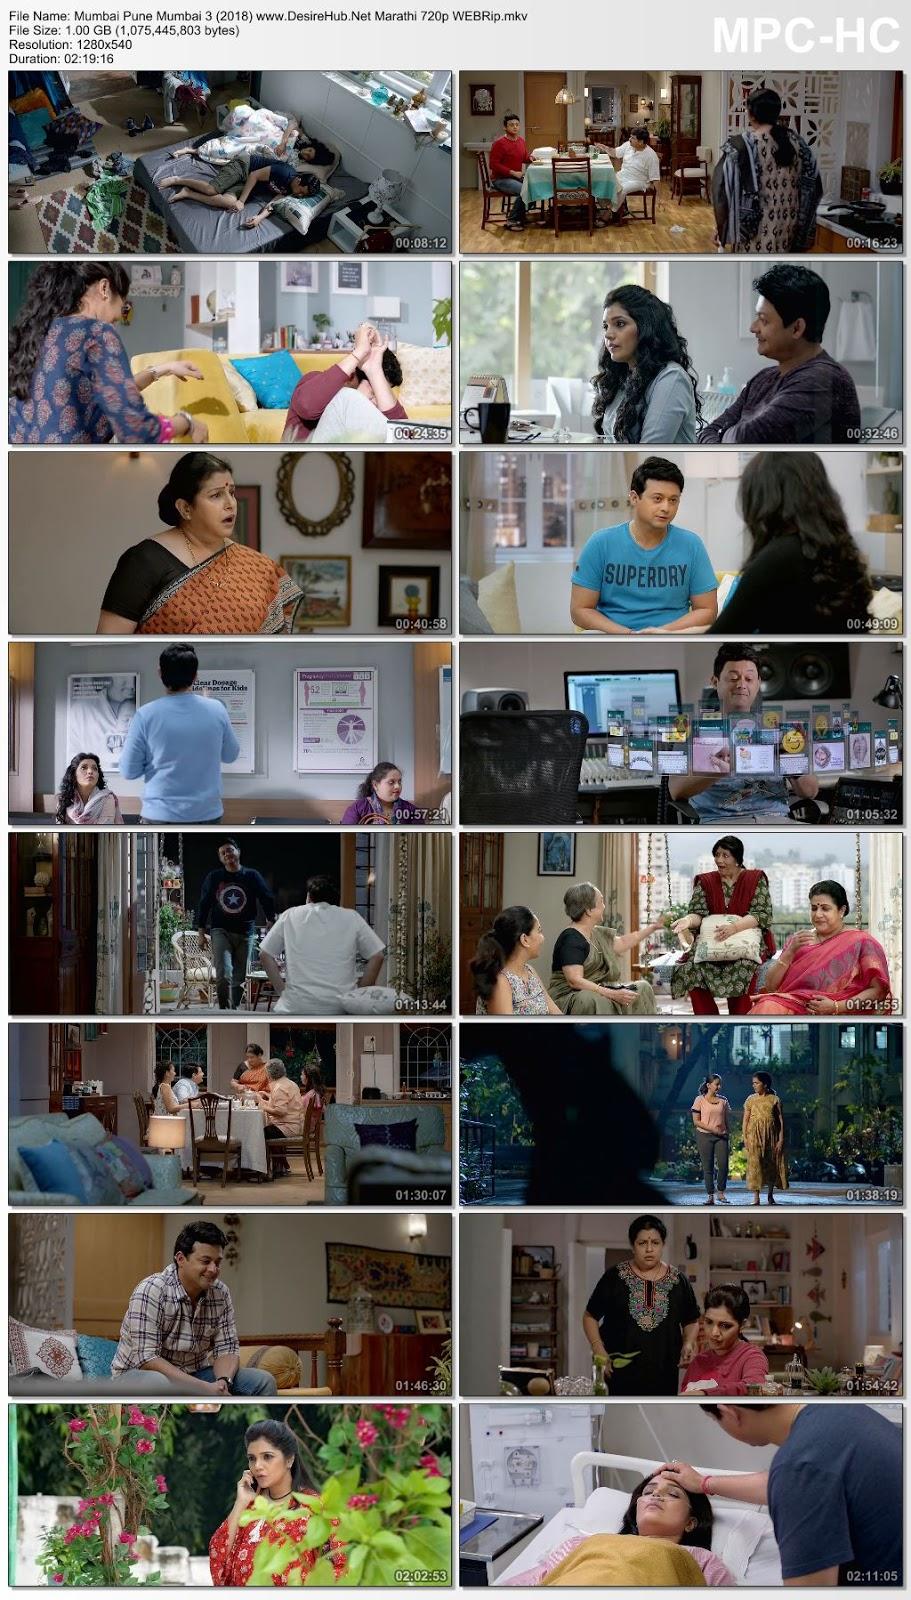 Mumbai Pune Mumbai 3 (2018) Marathi 720p WEBRip 1GB Desirehub